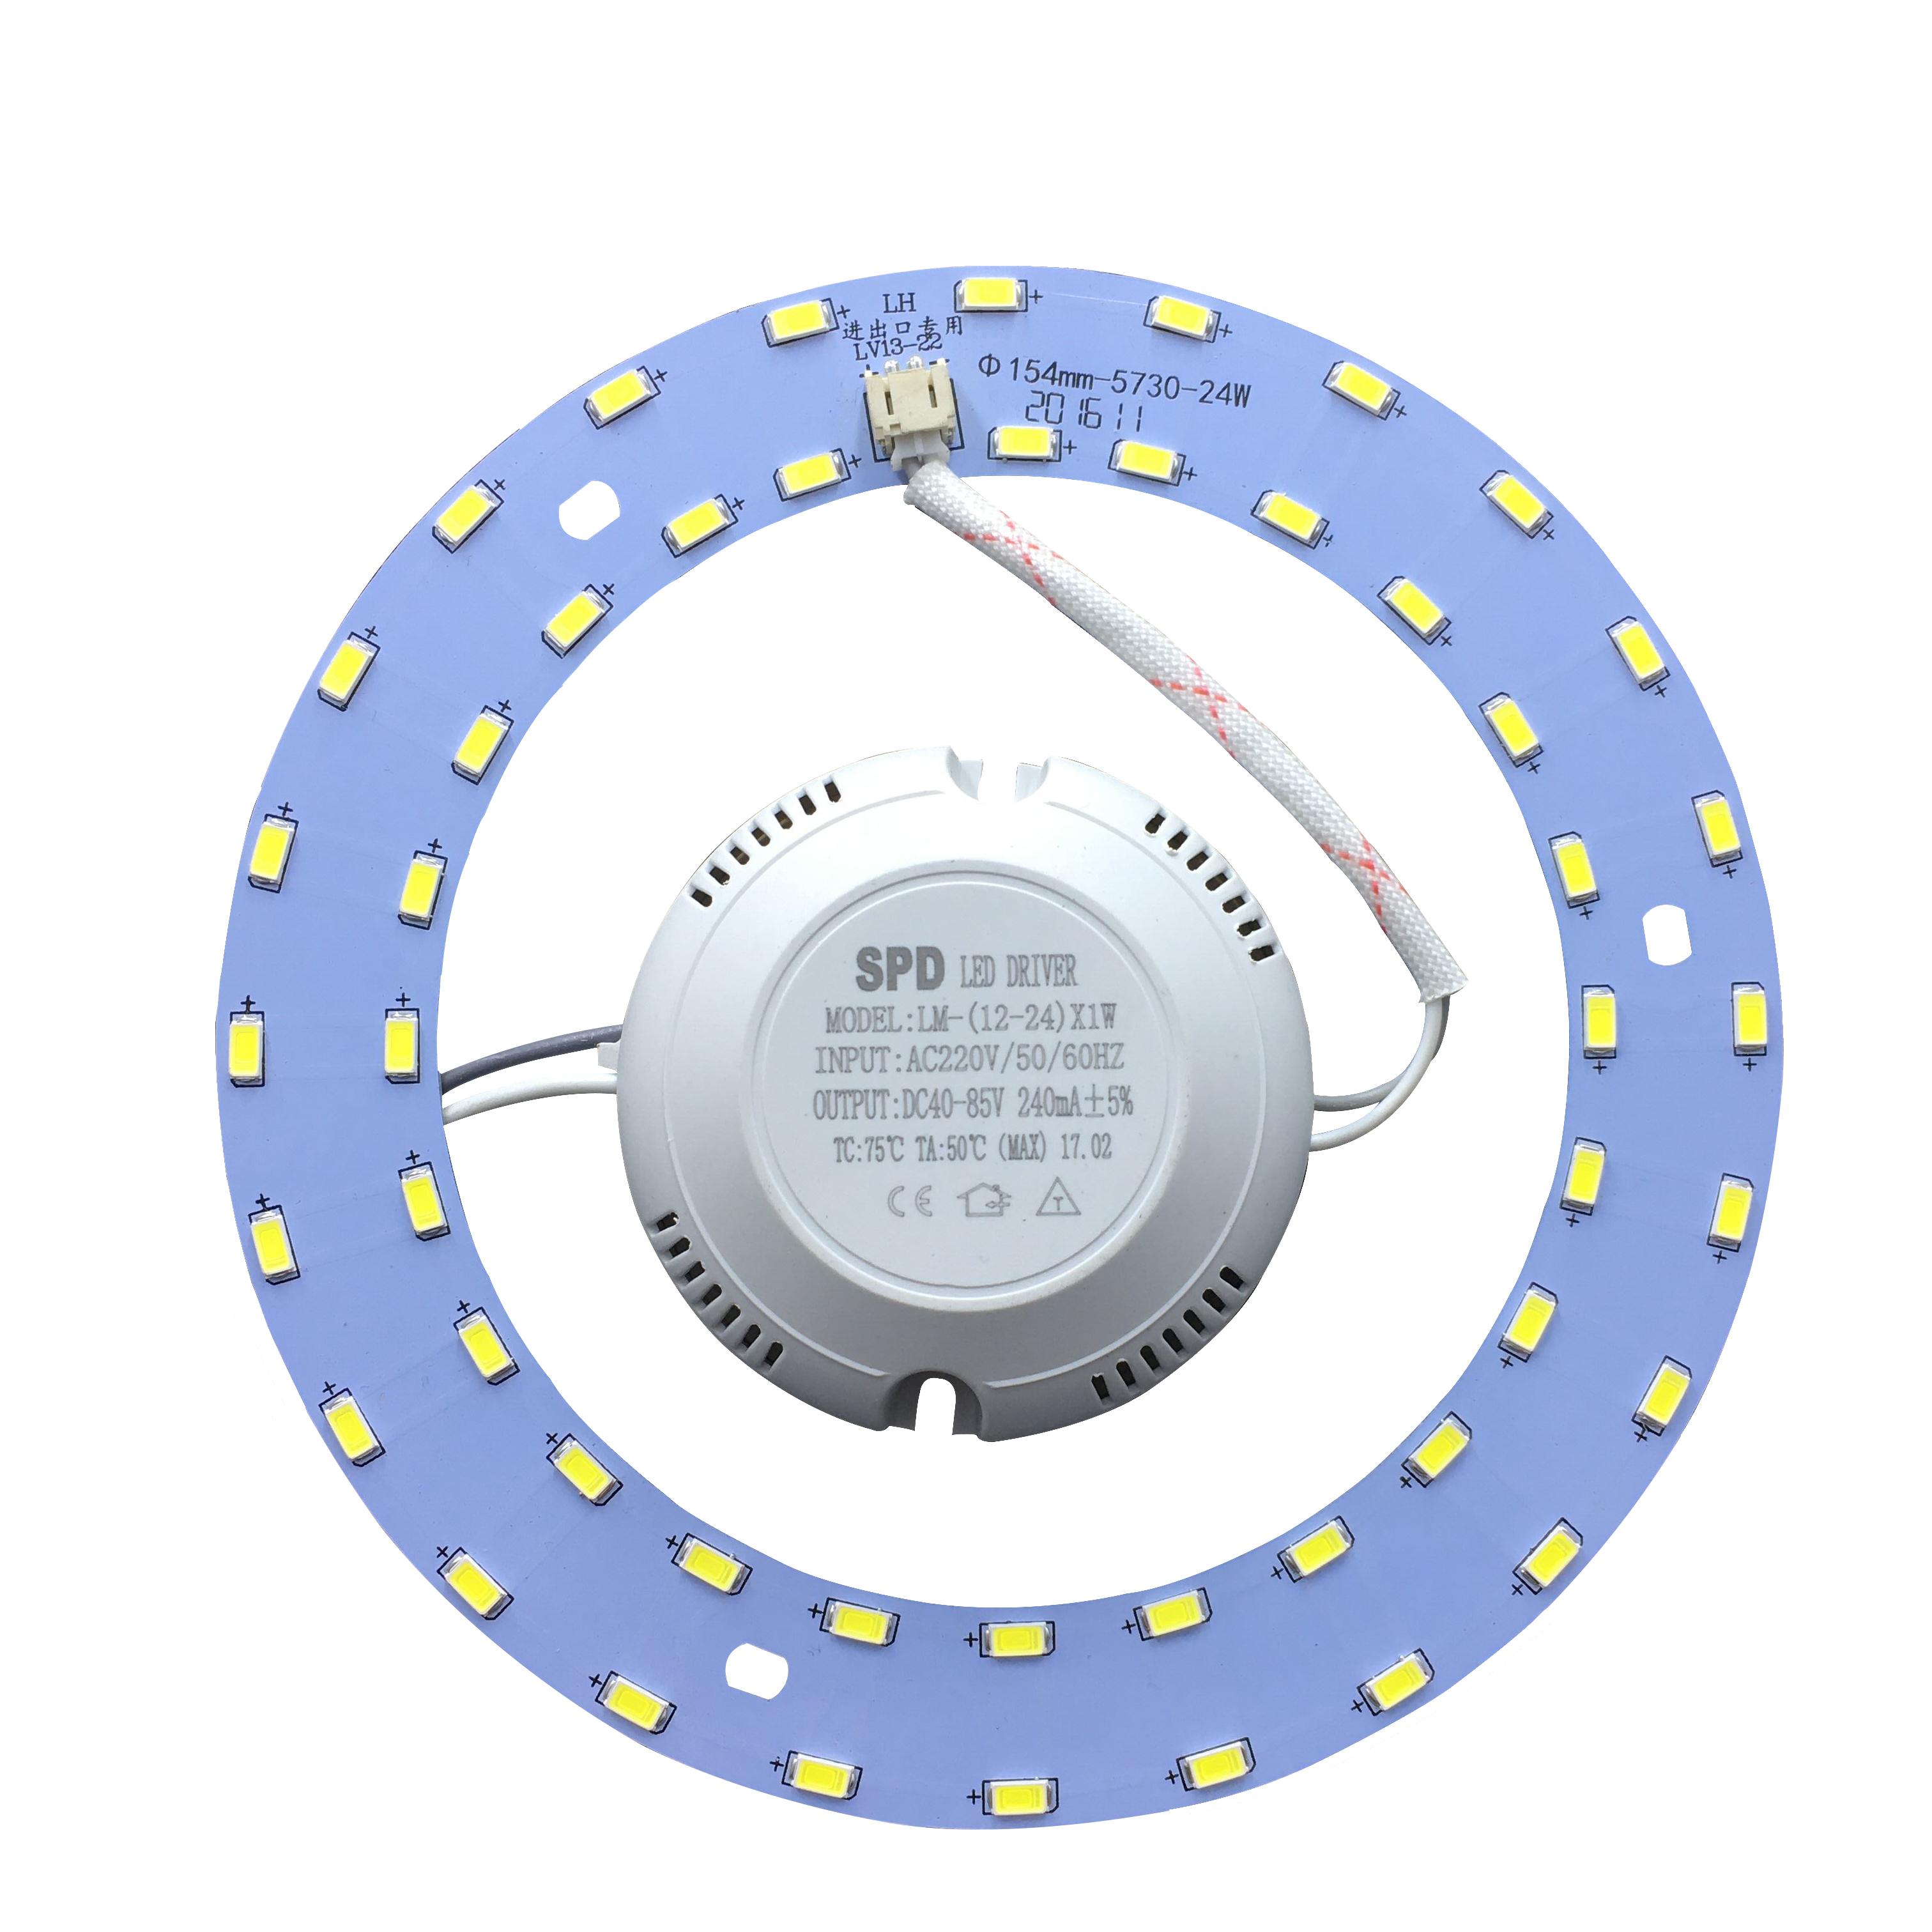 LED灯板圆形家用超亮灯芯LED灯泡吸顶灯改造灯板节能LED灯片灯盘